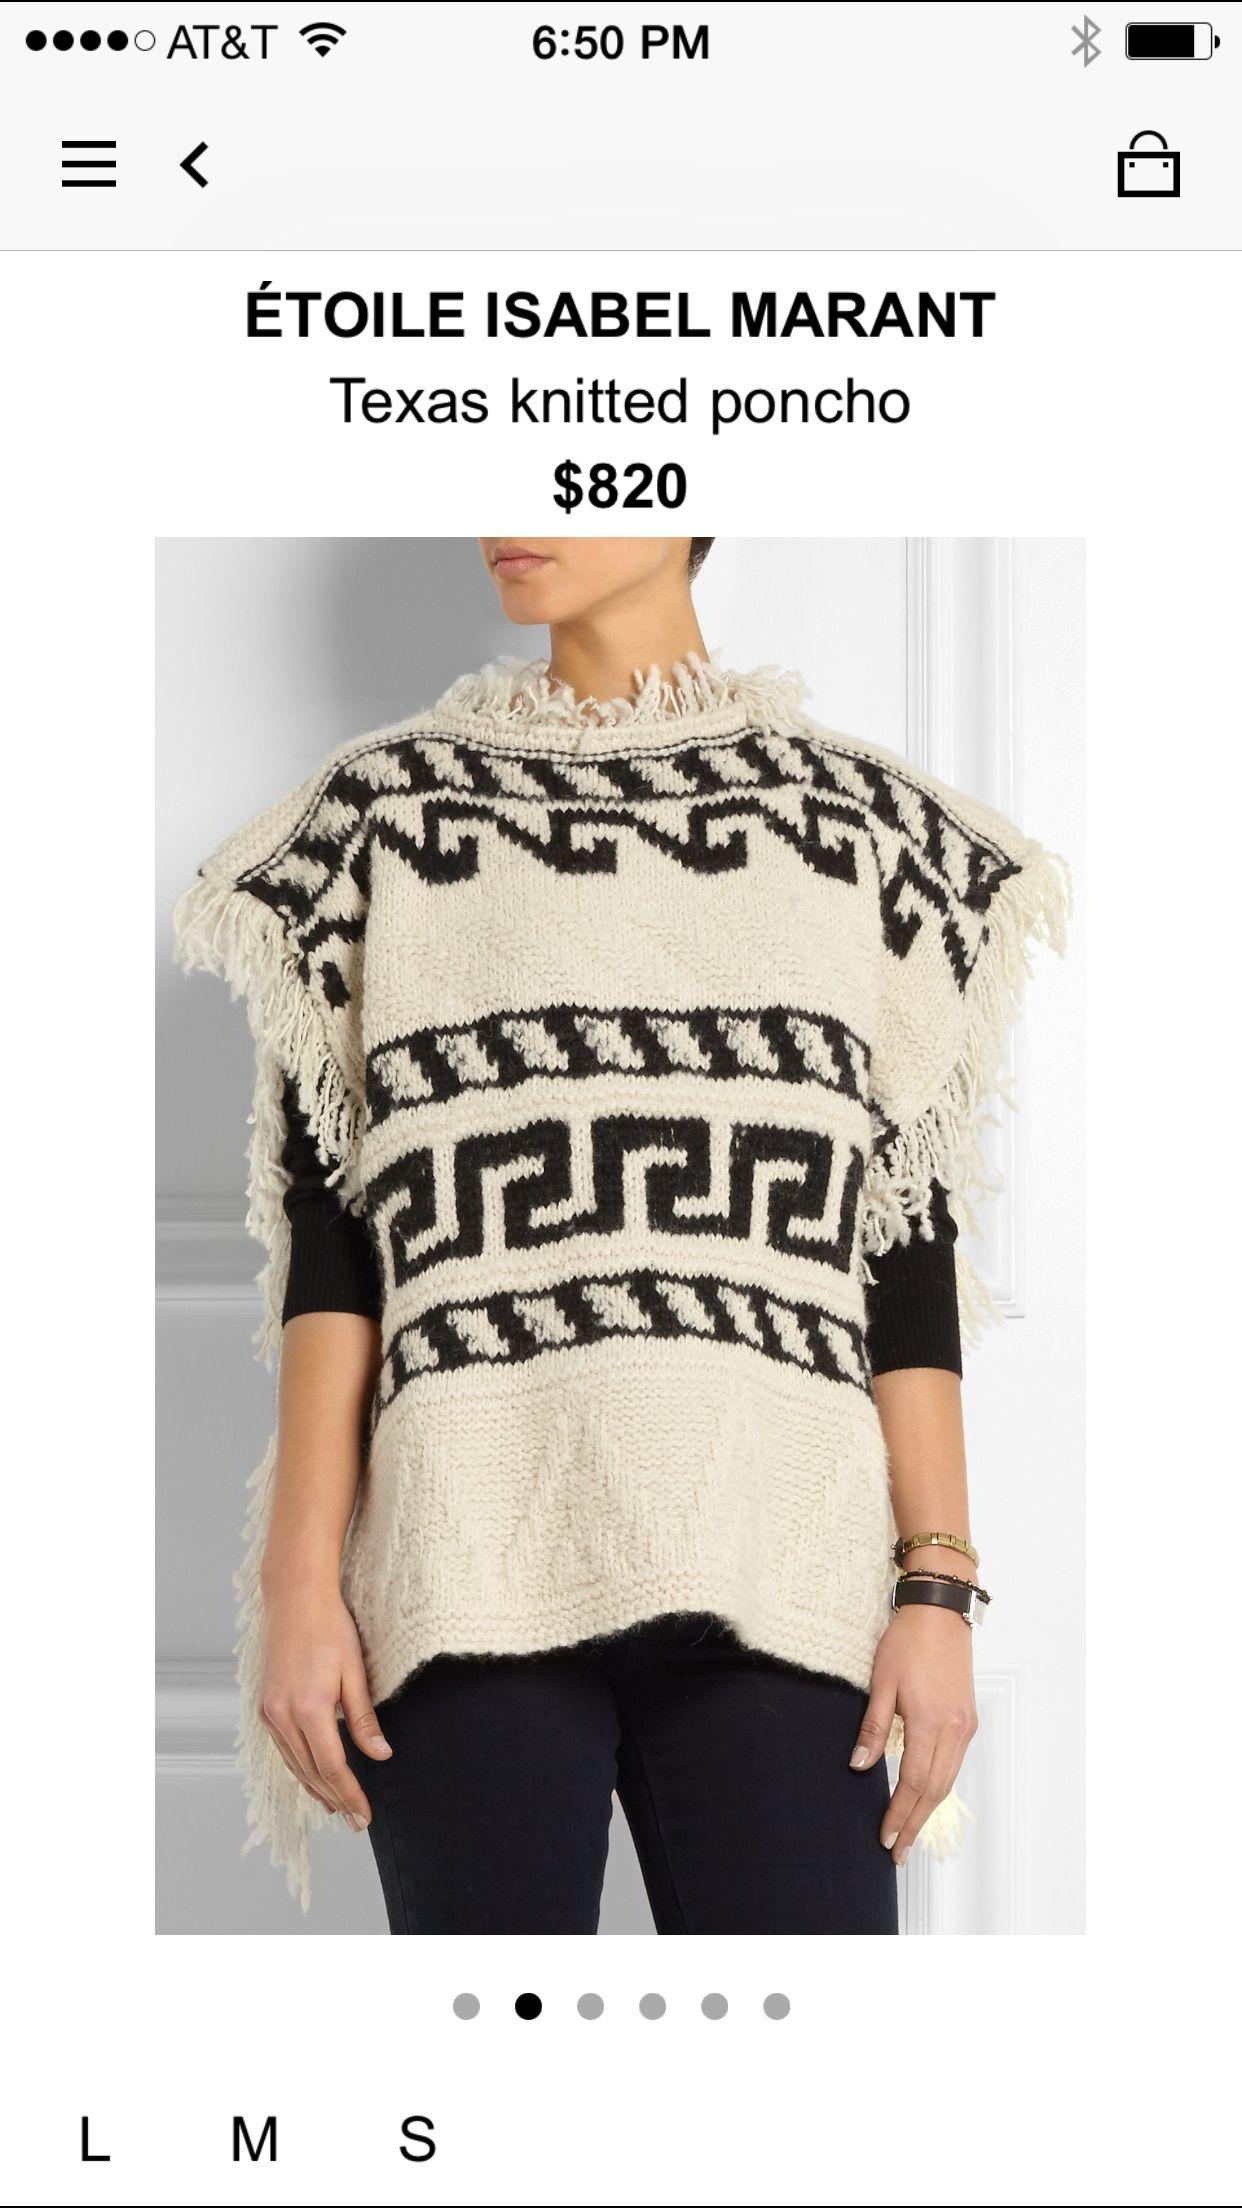 84f2e7649c66 Net a porter | fashion | Knitted poncho, Designer clothes sale ...